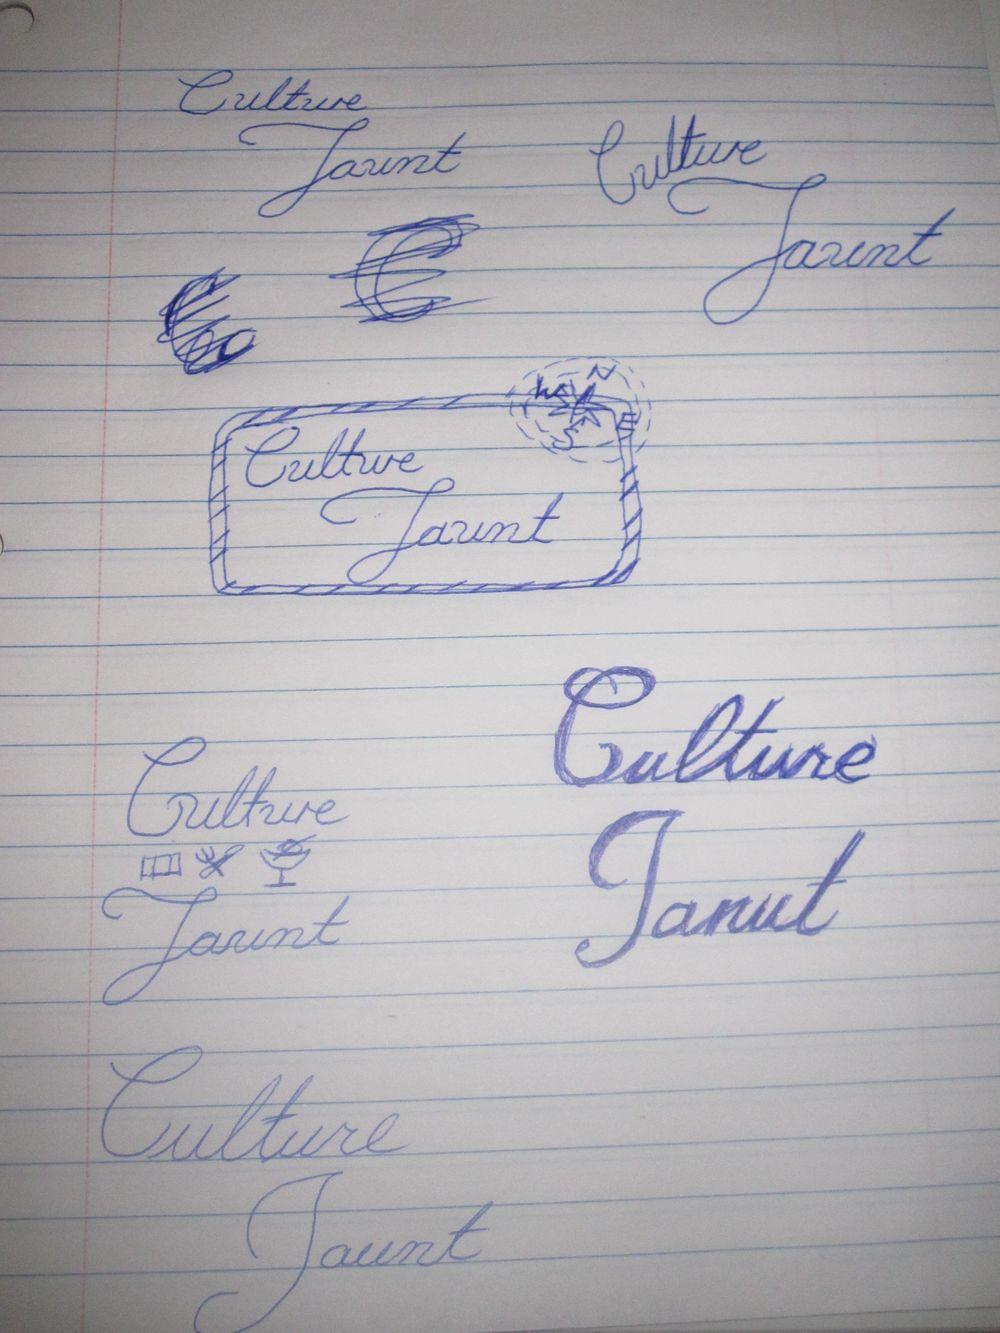 Culture Jaunt - image 1 - student project